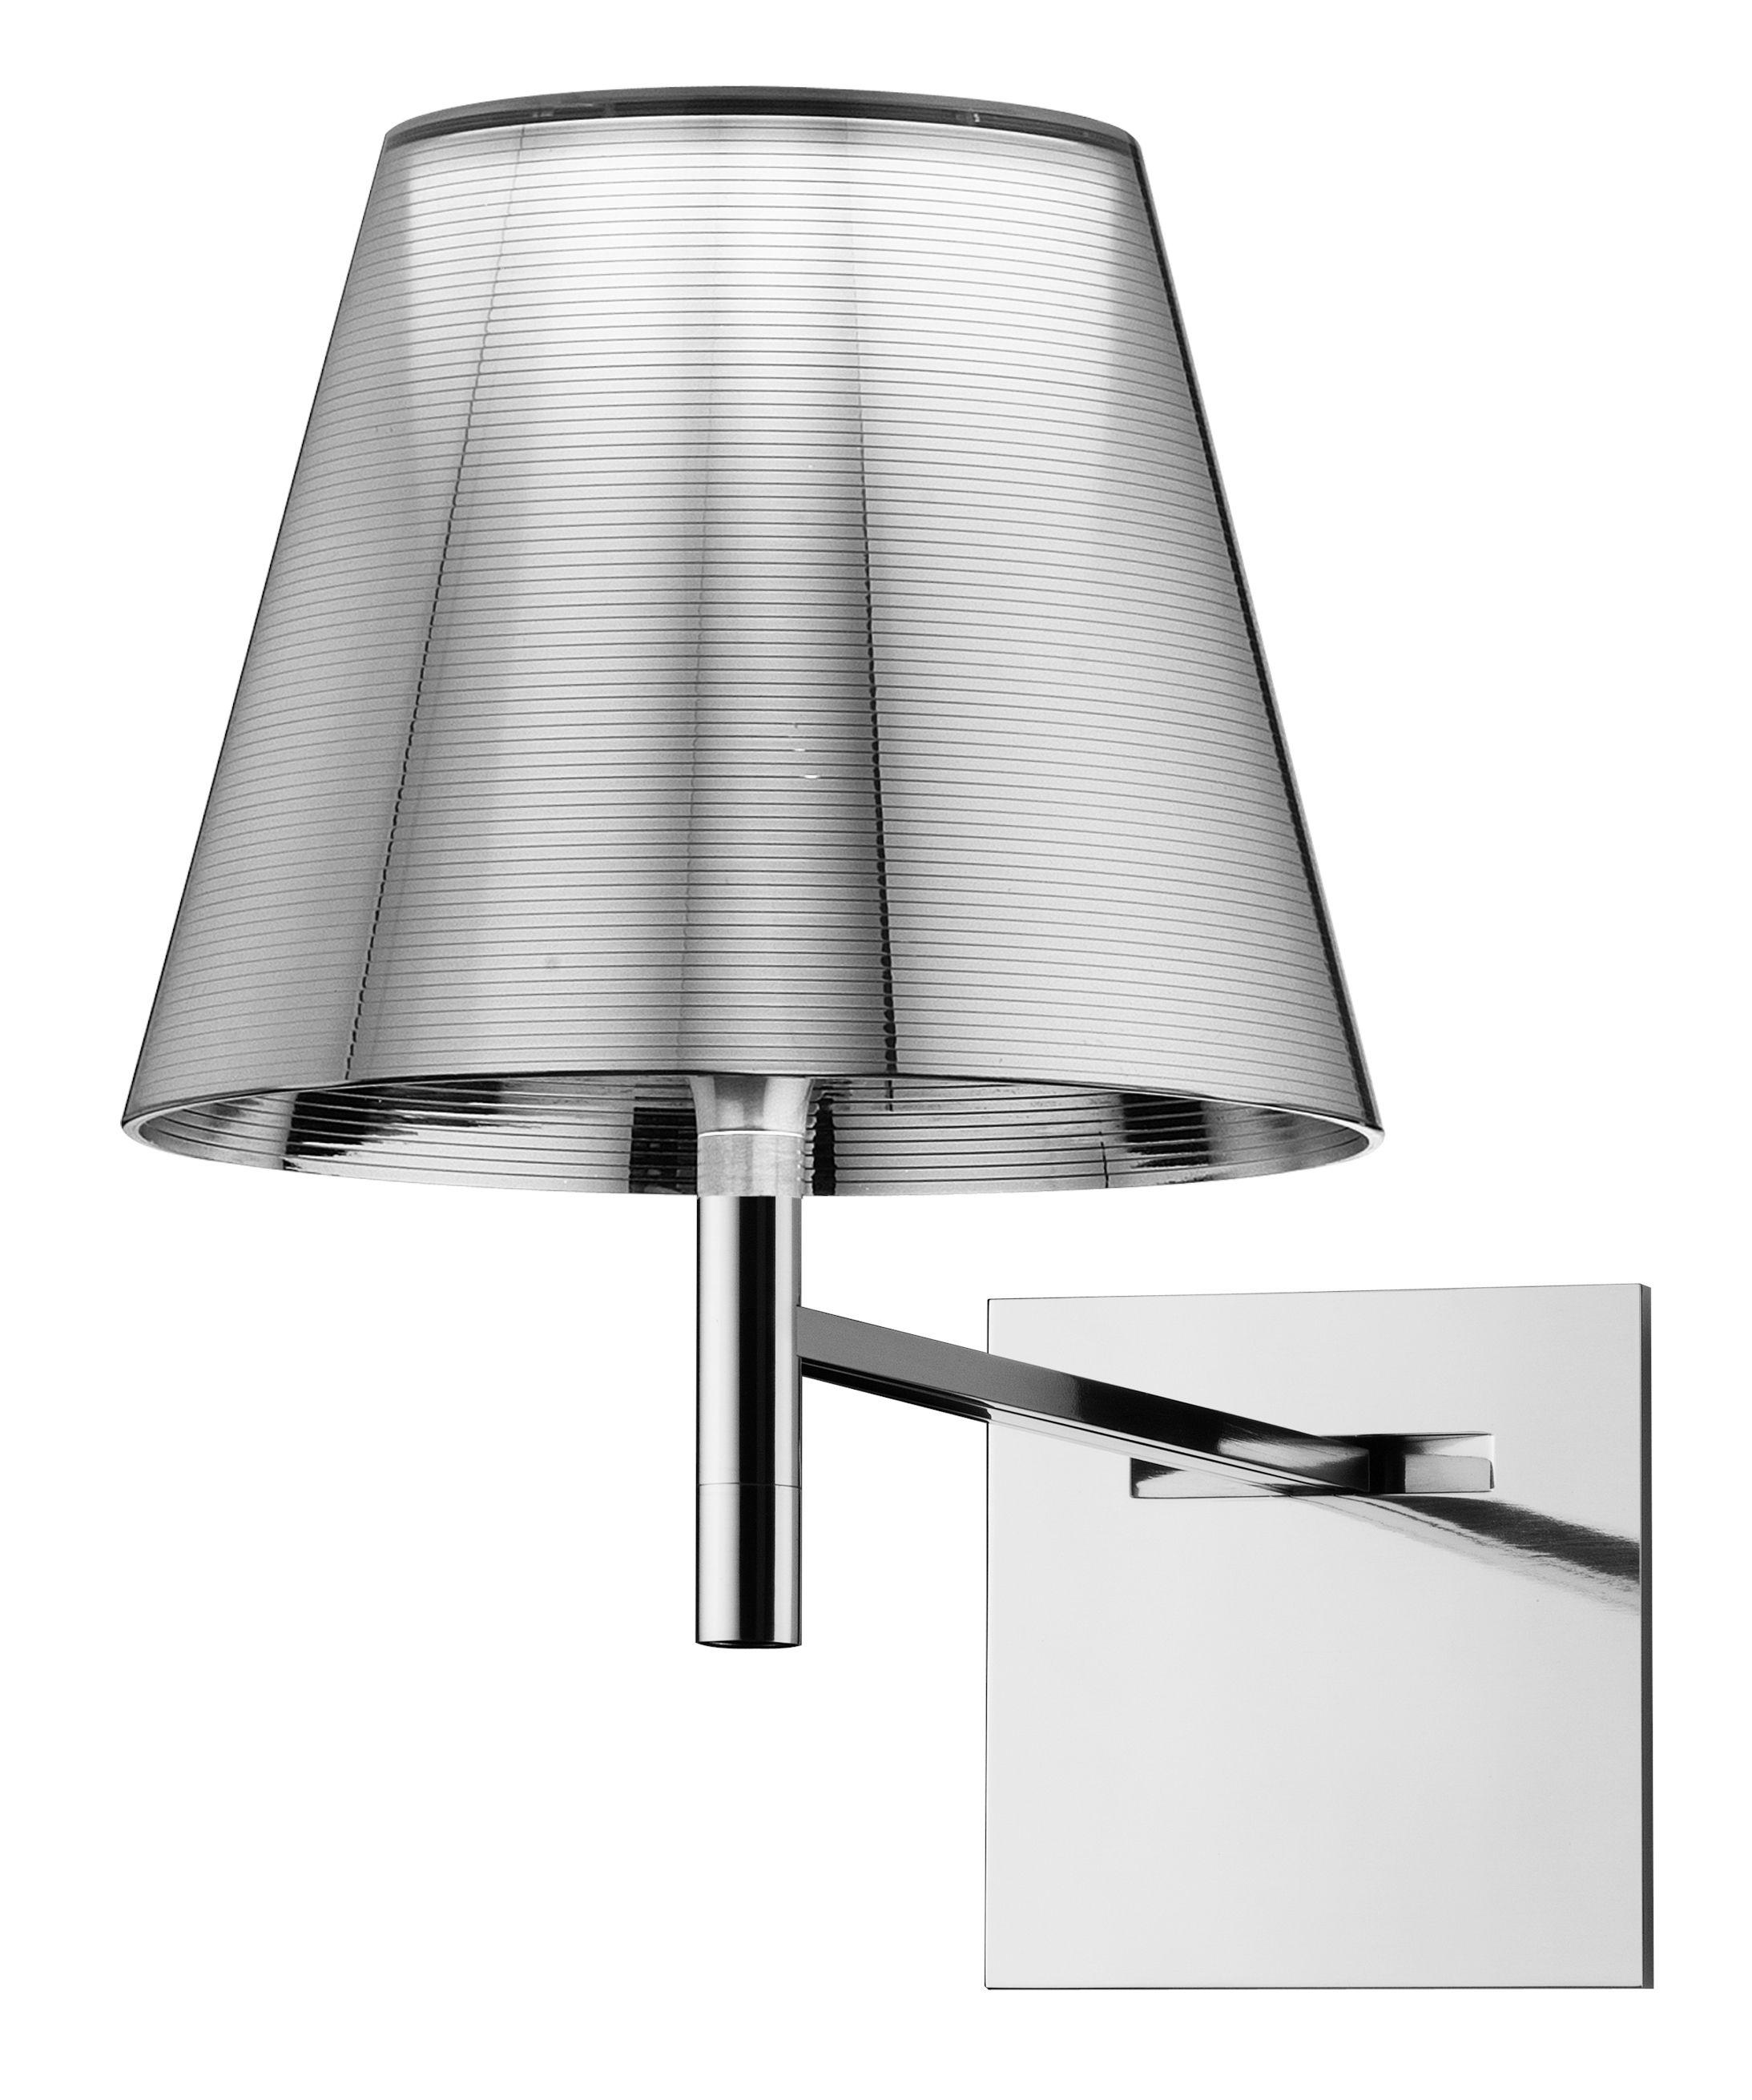 Leuchten - Wandleuchten - K Tribe W Wandleuchte - Flos - Silber-metallic - PMMA, poliertes Aluminium